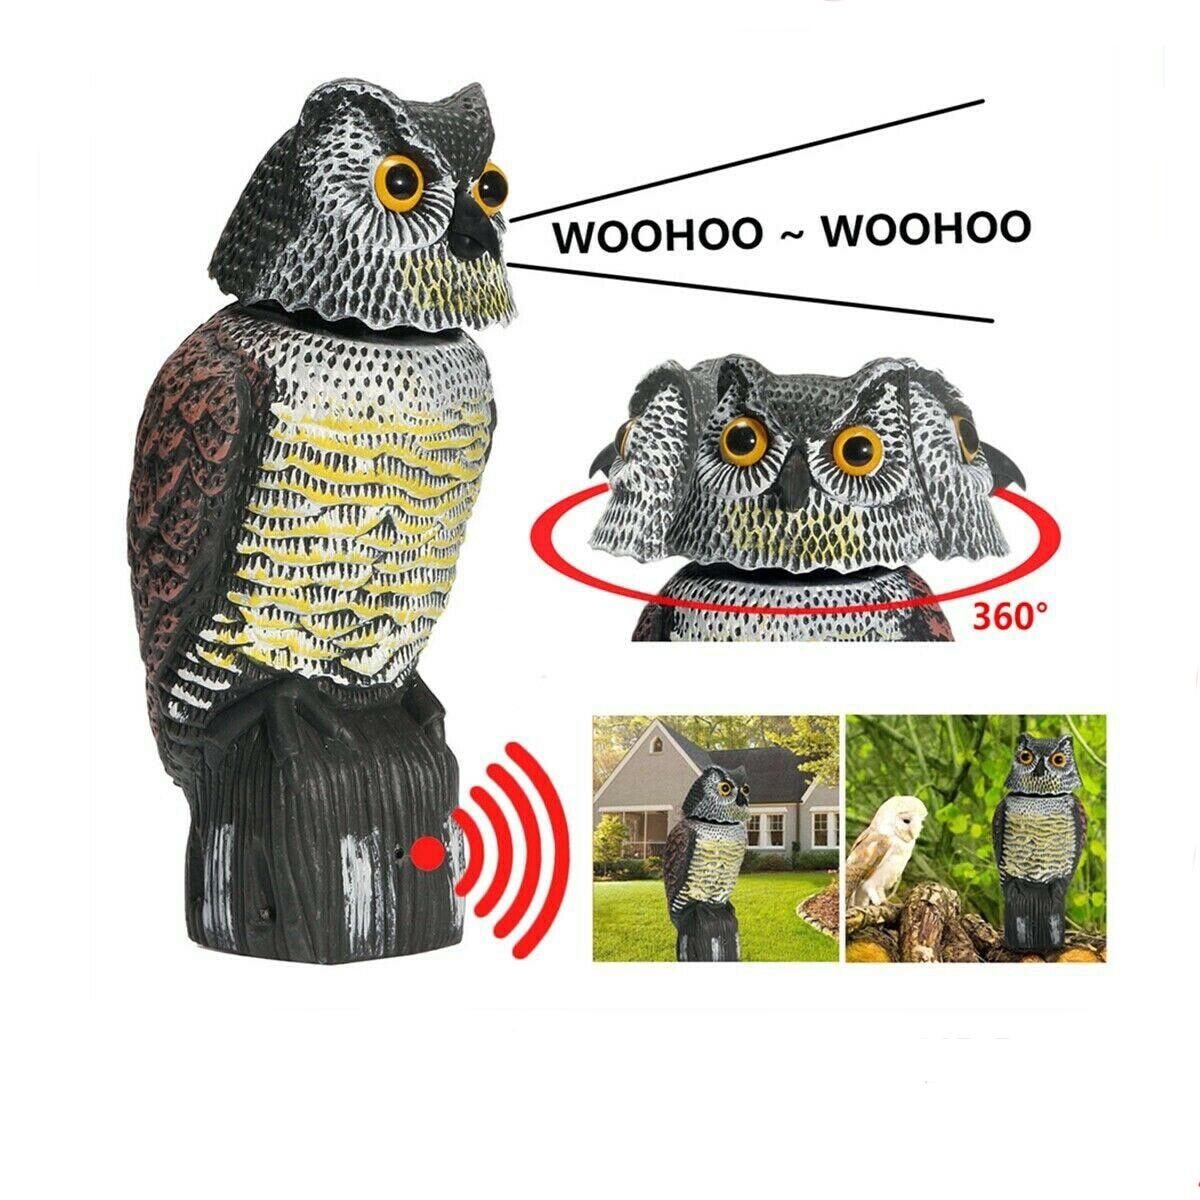 Bird Scarer 360°Rotate Head Sound Owl Decoy Protection Repellent Pest Control Scarecrow Garden Yard Move Decor